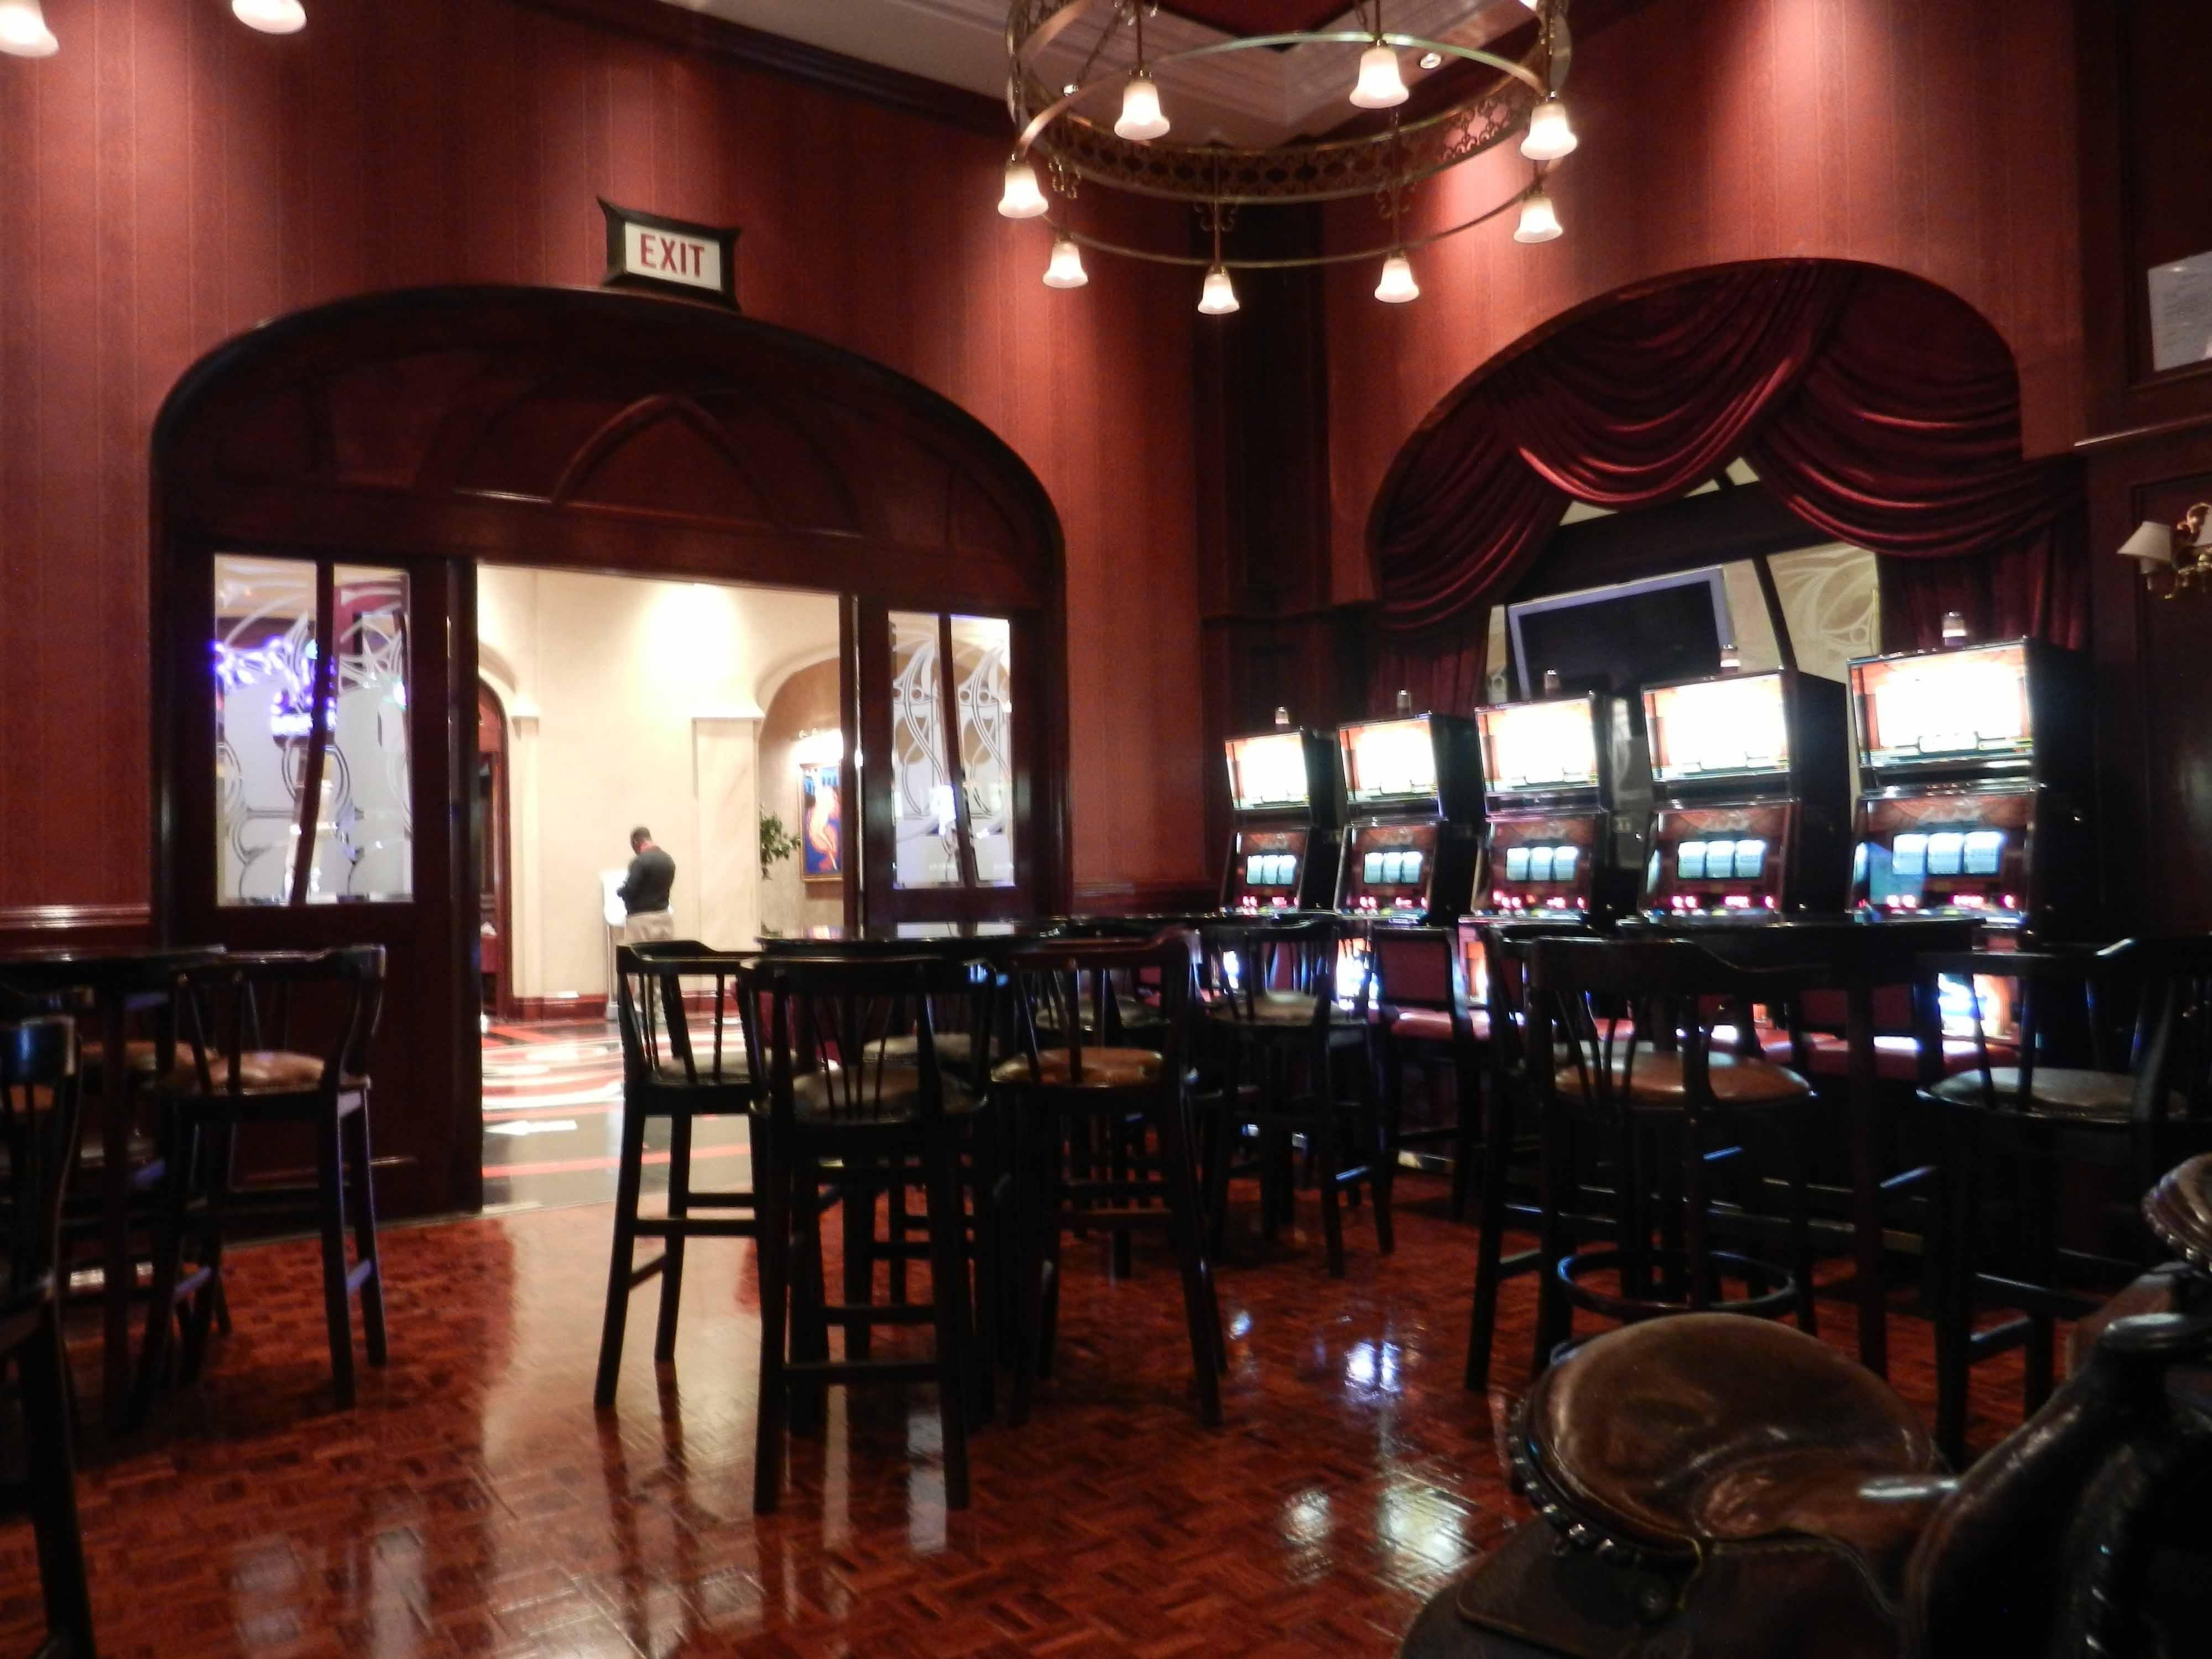 wisconsin gambling tax laws